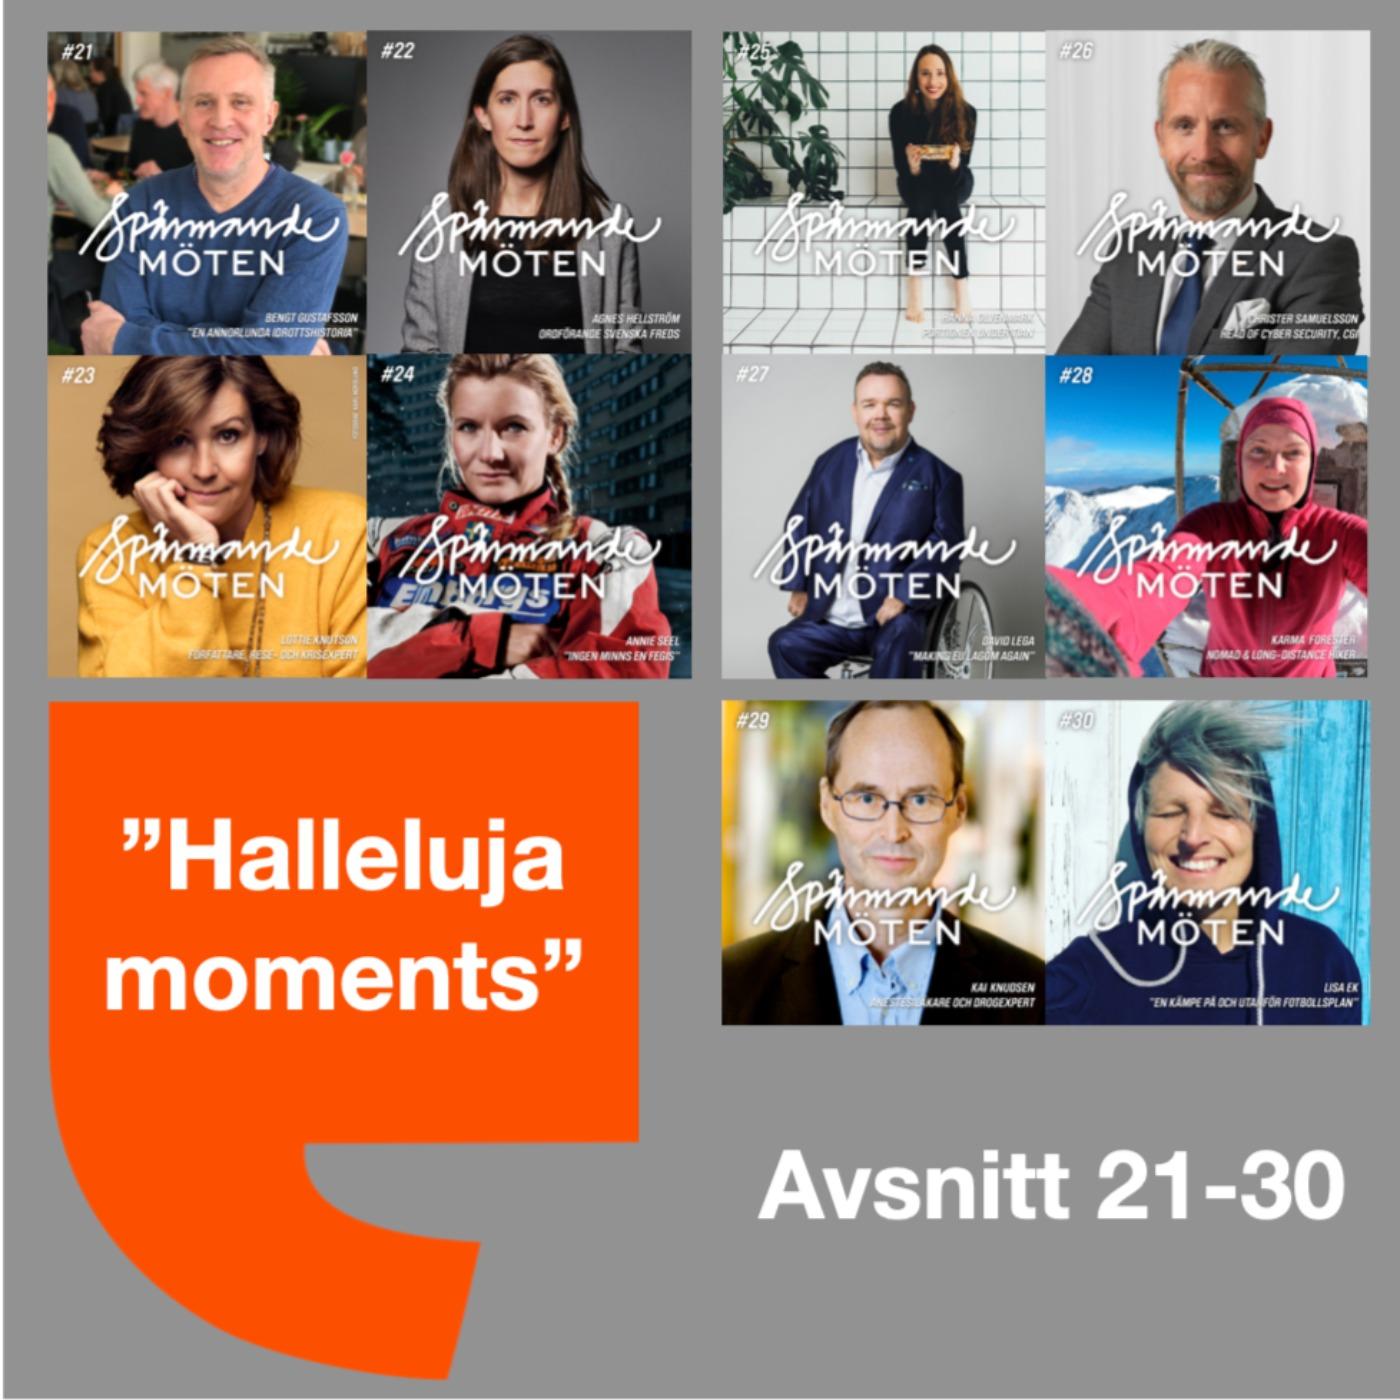 Halleluja moments avsnitt 21-30